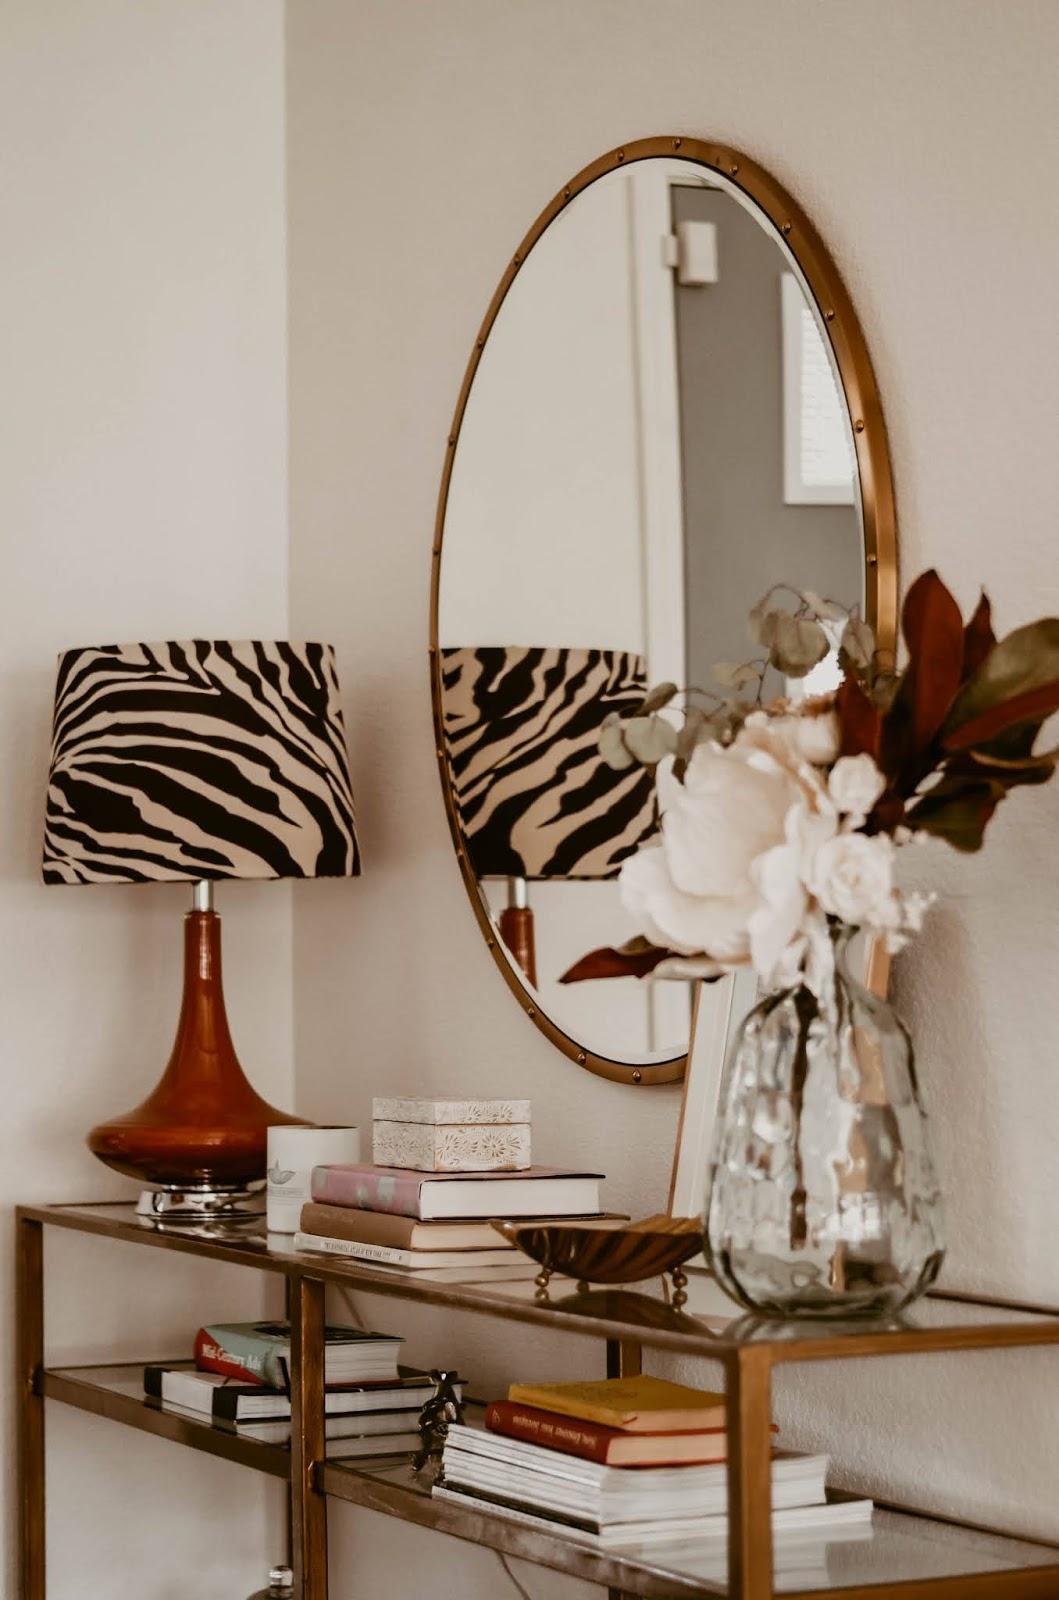 midcentury-lampshade-diy-makeover-chocolate-brown-and-cream-zebra-animal-print-skirt-fabric-lampshade-diy-makeover